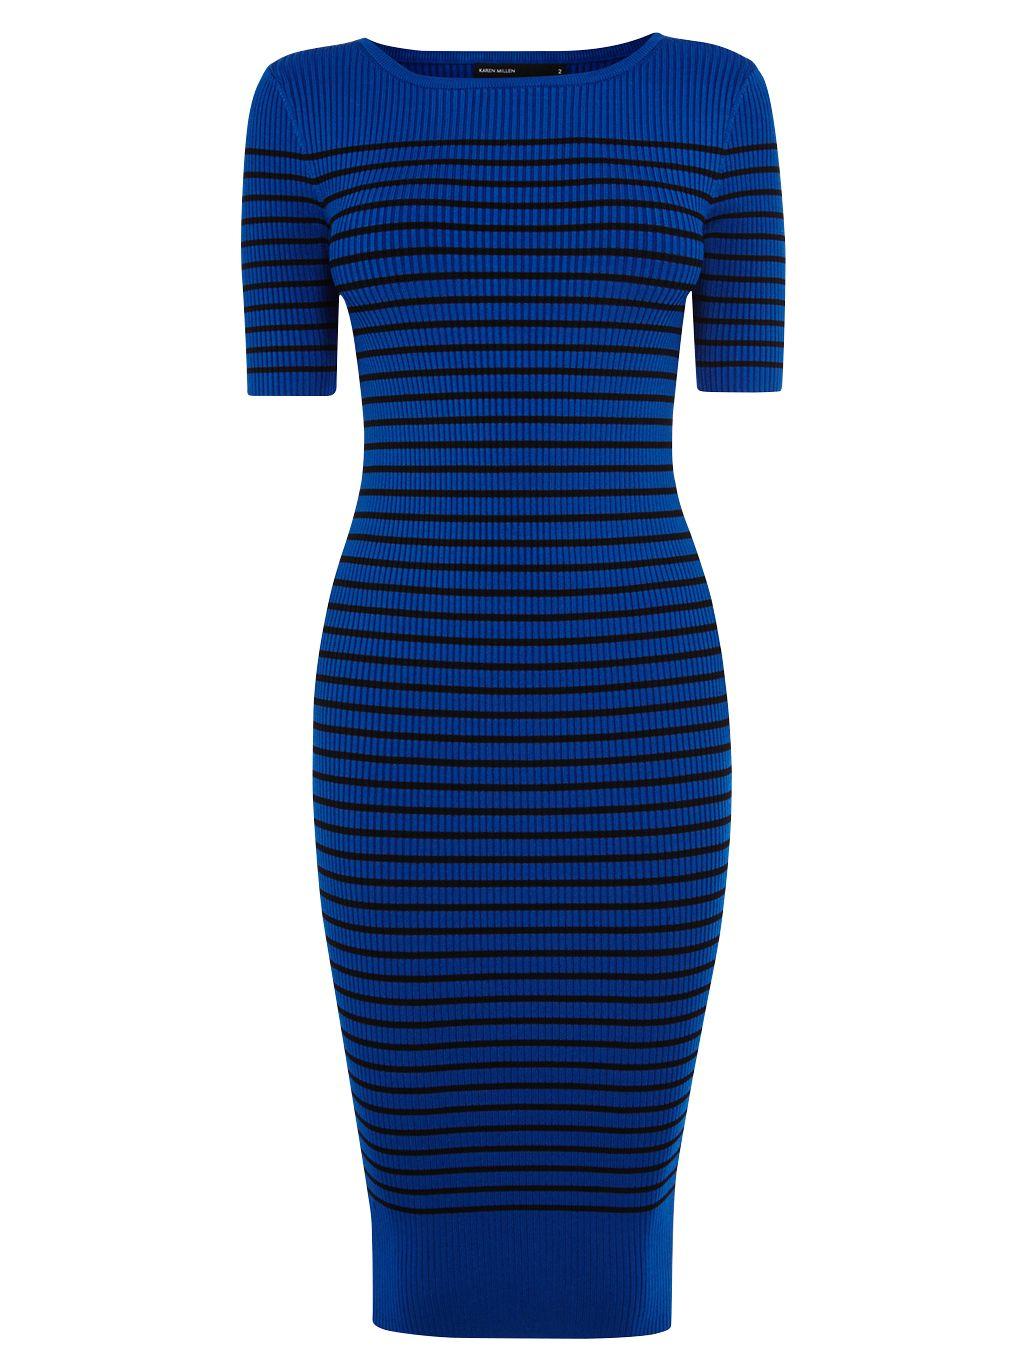 karen millen stripe rib knit dress blue, karen, millen, stripe, rib, knit, dress, blue, karen millen, 1|3|4|2, women, womens dresses, 1893596